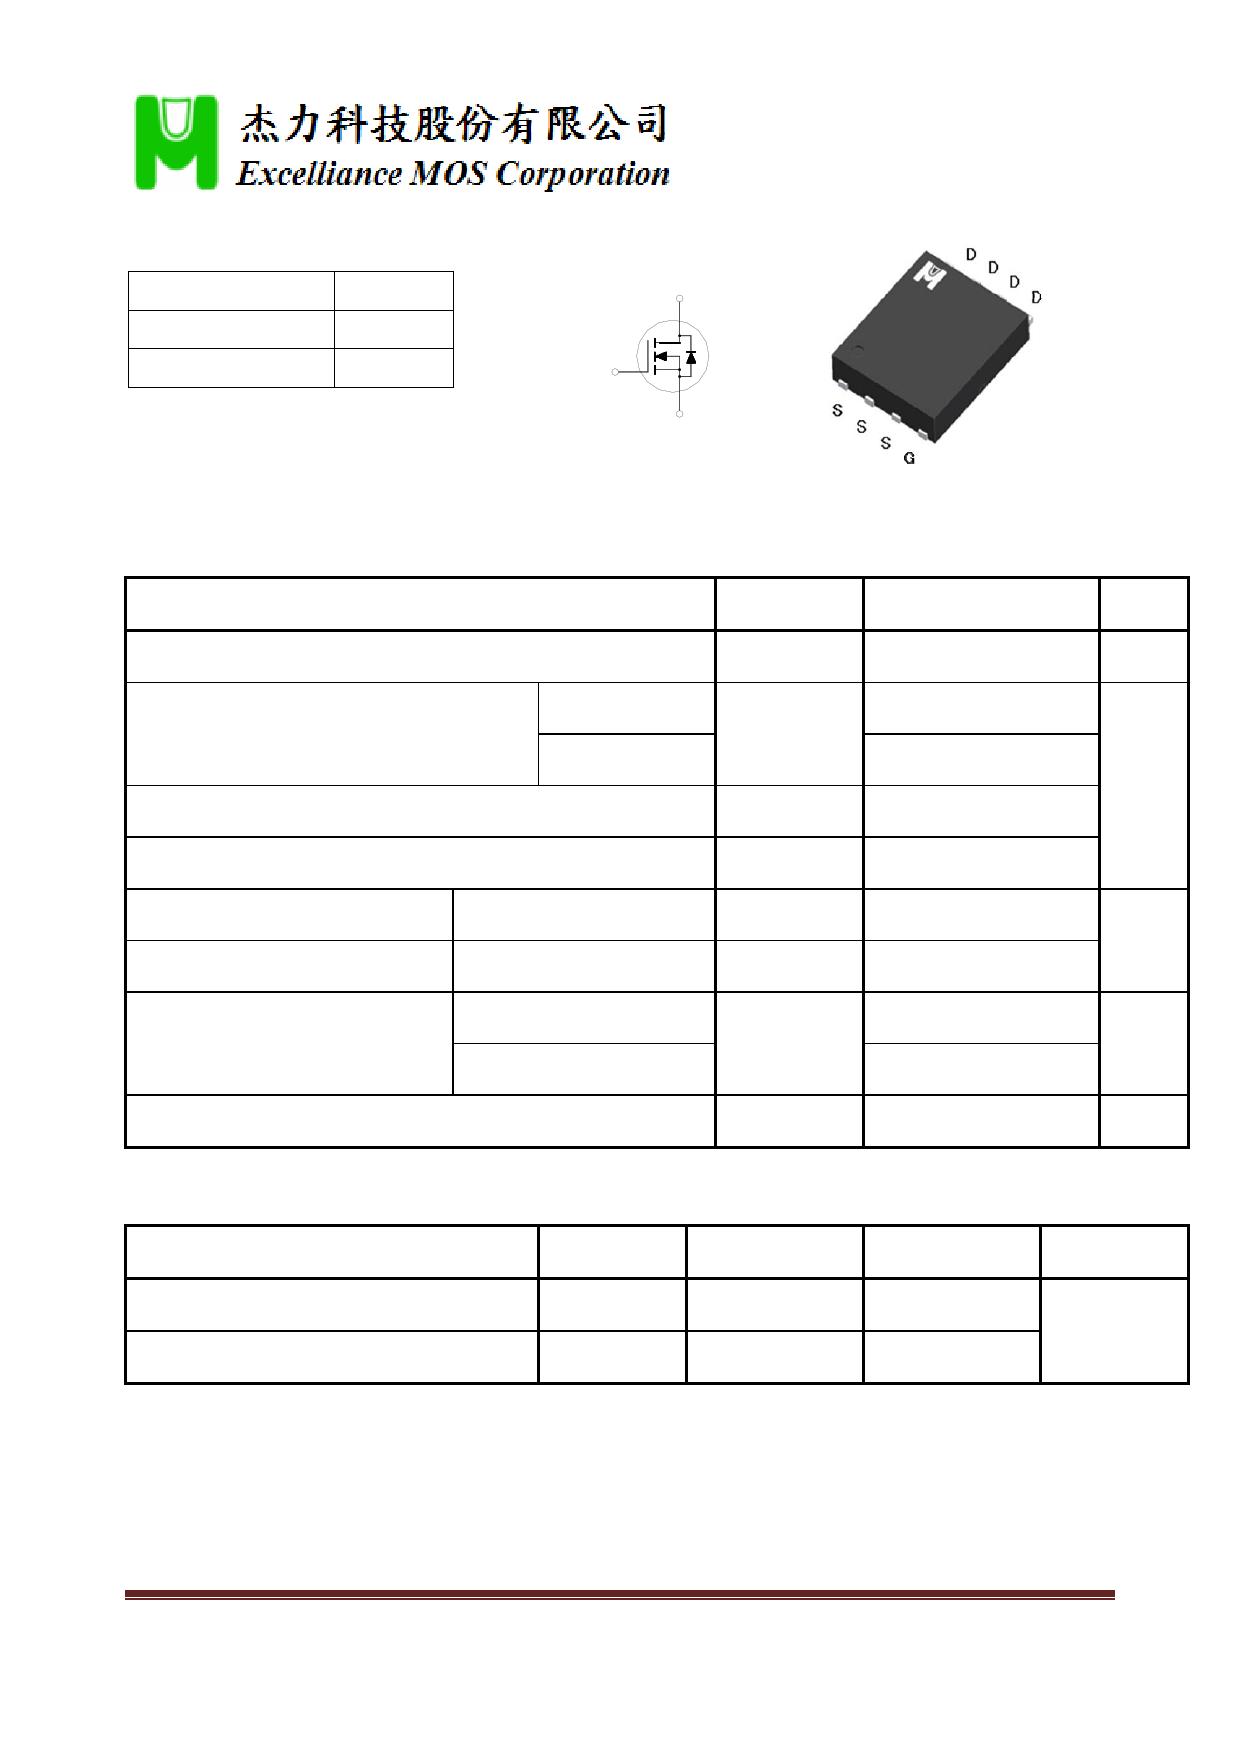 EMB09N03H دیتاشیت PDF